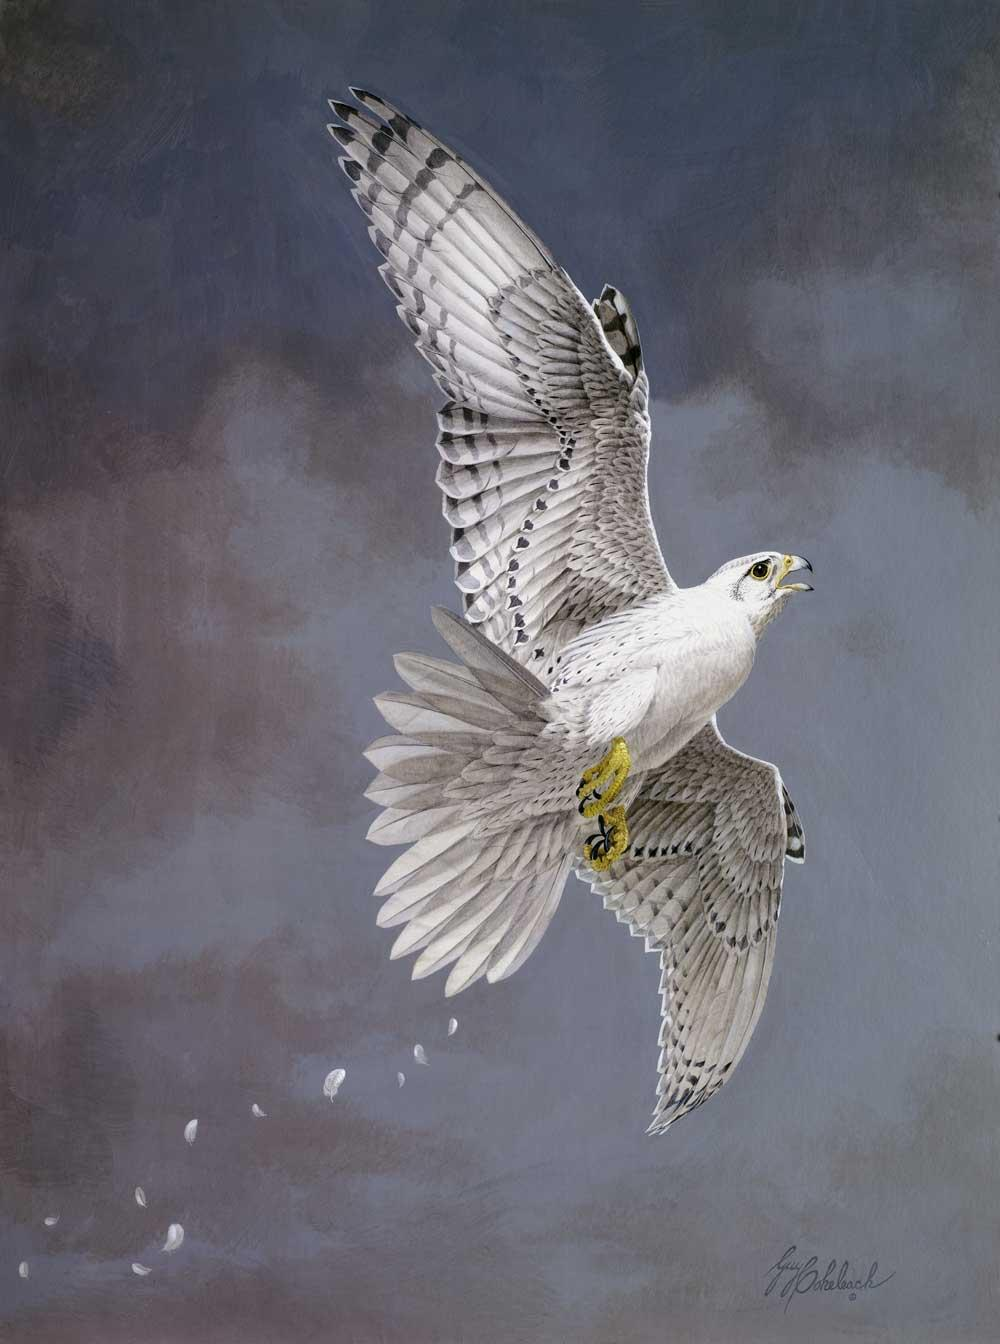 """White Gyrfalcon""  -  40"" x 30"" ""White Gyrfalcon""  Birds of Prey  Raptors"